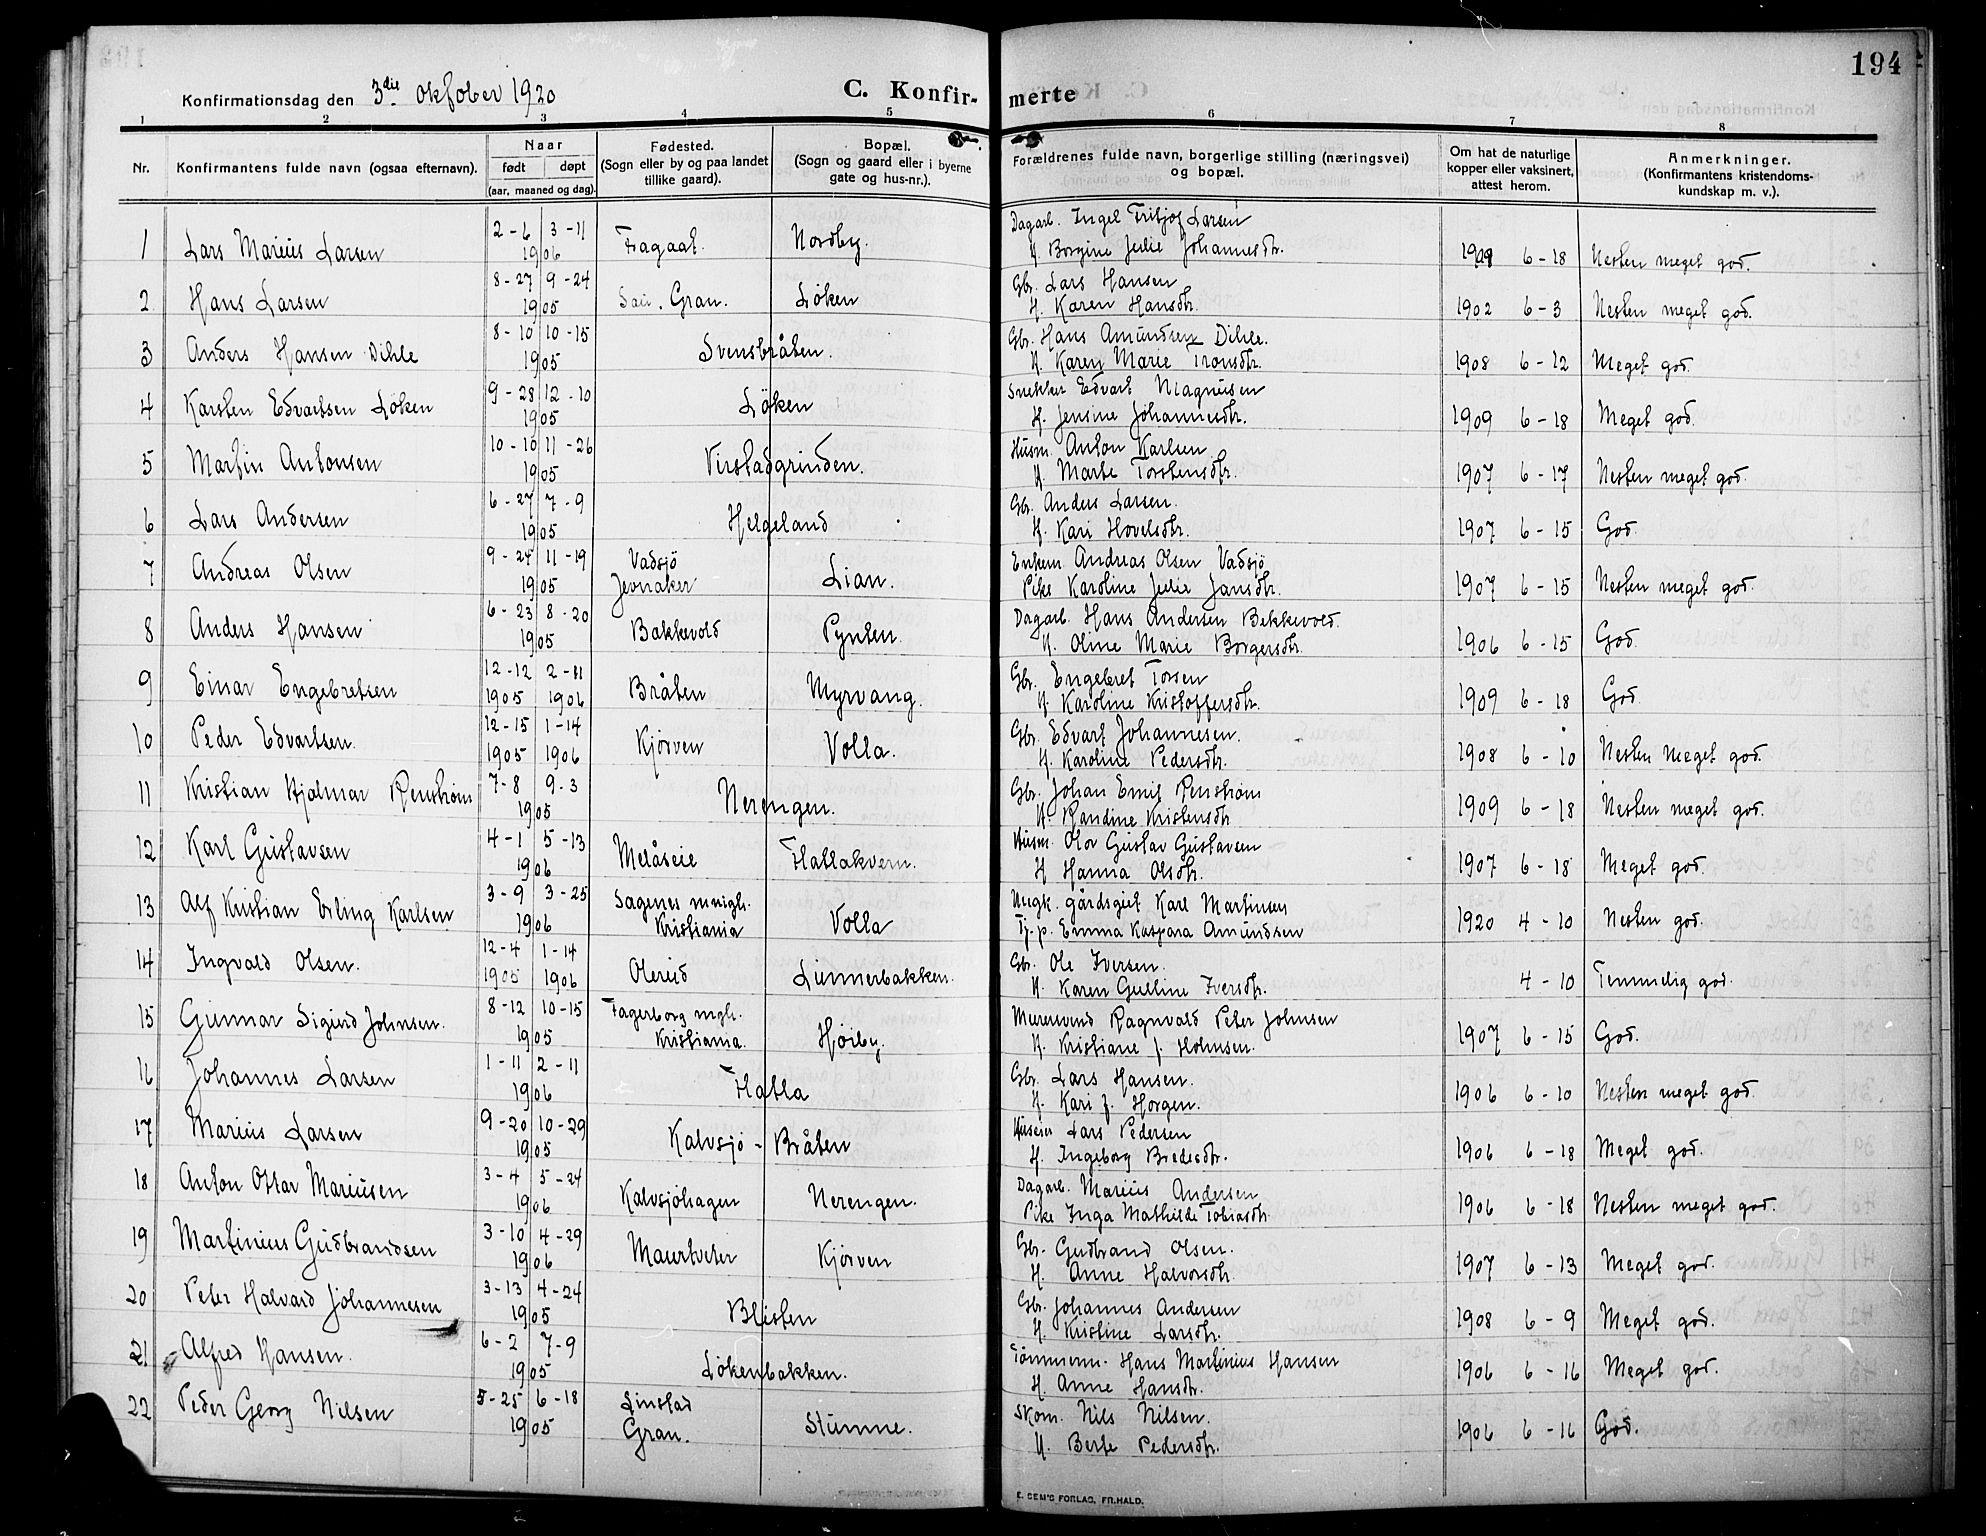 SAH, Lunner prestekontor, H/Ha/Hab/L0001: Klokkerbok nr. 1, 1909-1922, s. 194